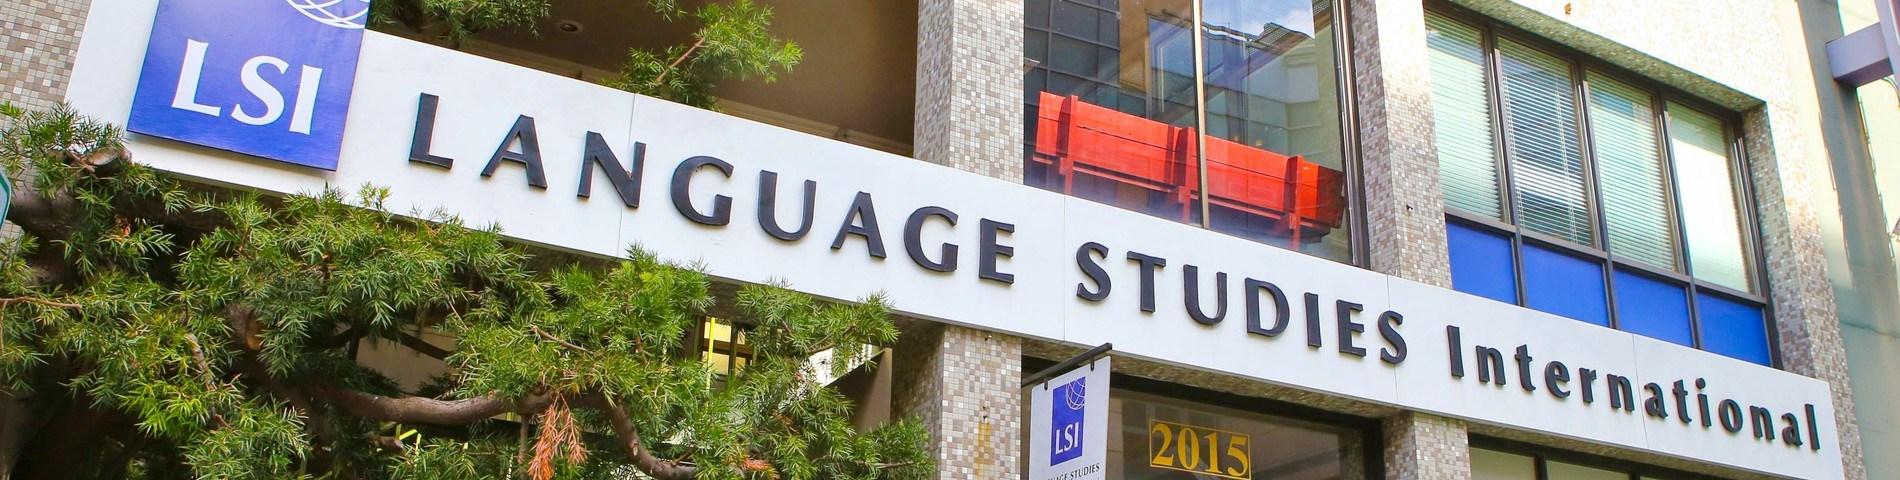 LSI - Language Studies International画像1